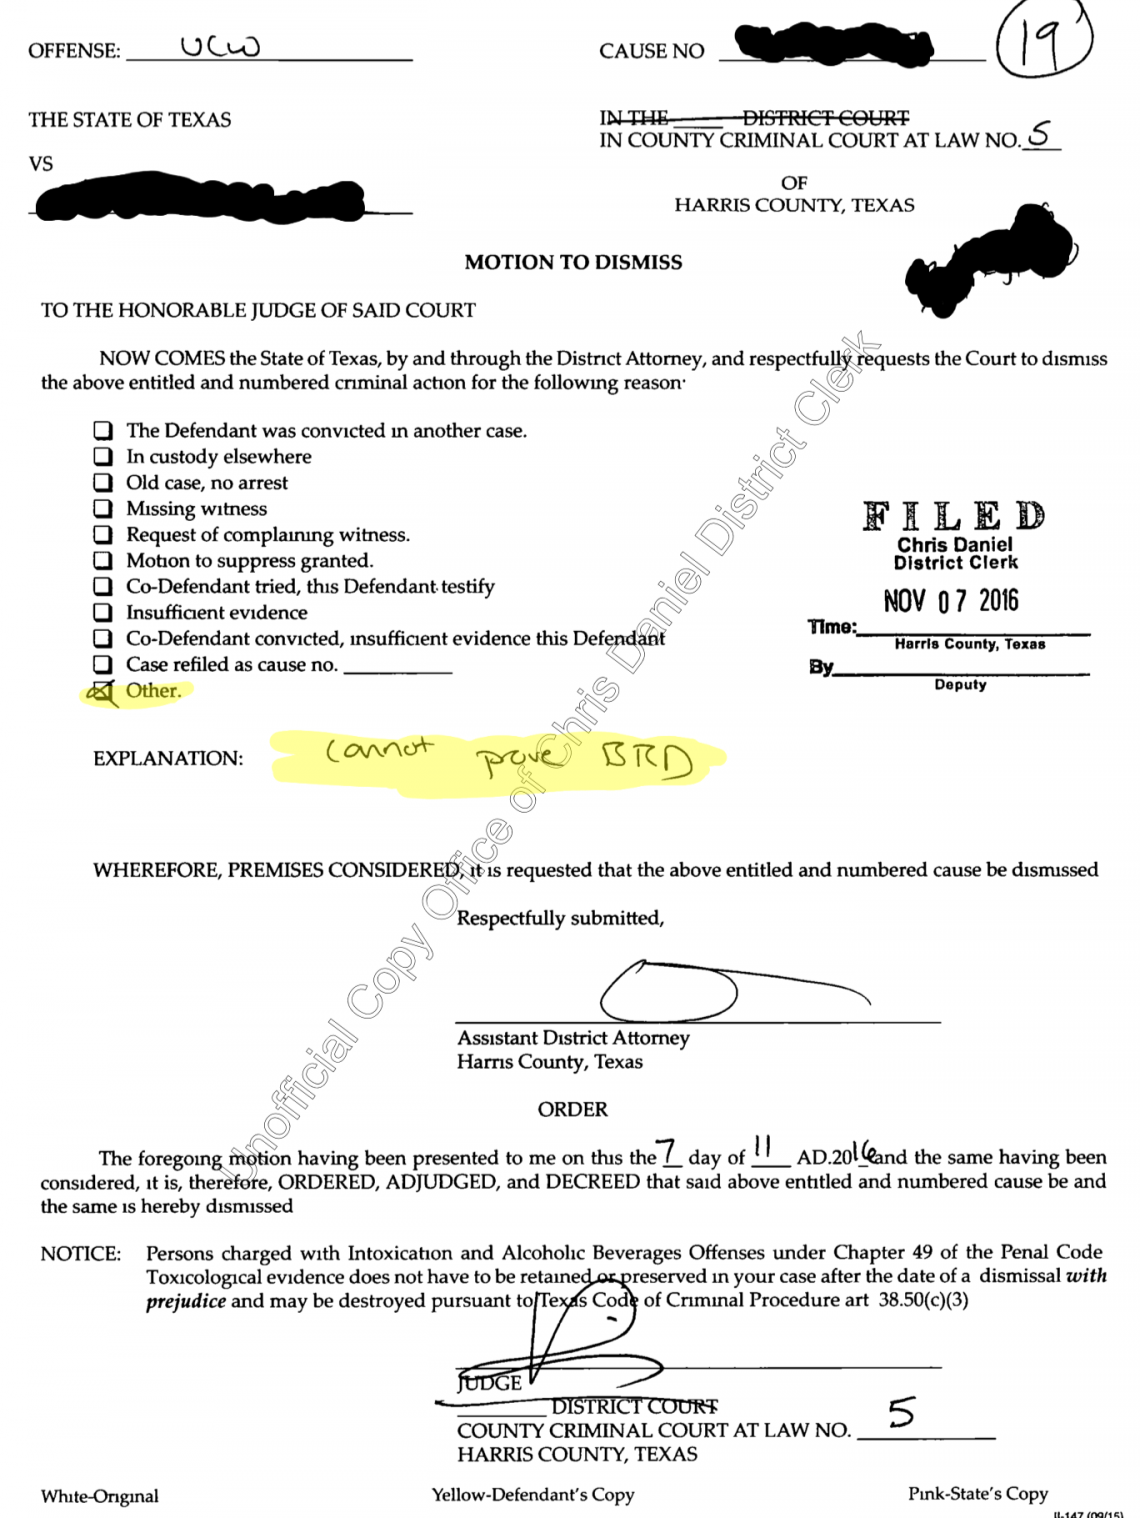 Affidavit Of Fact Form Texas Motor Vehicle Dmv Statement General Sle Facts Louisiana